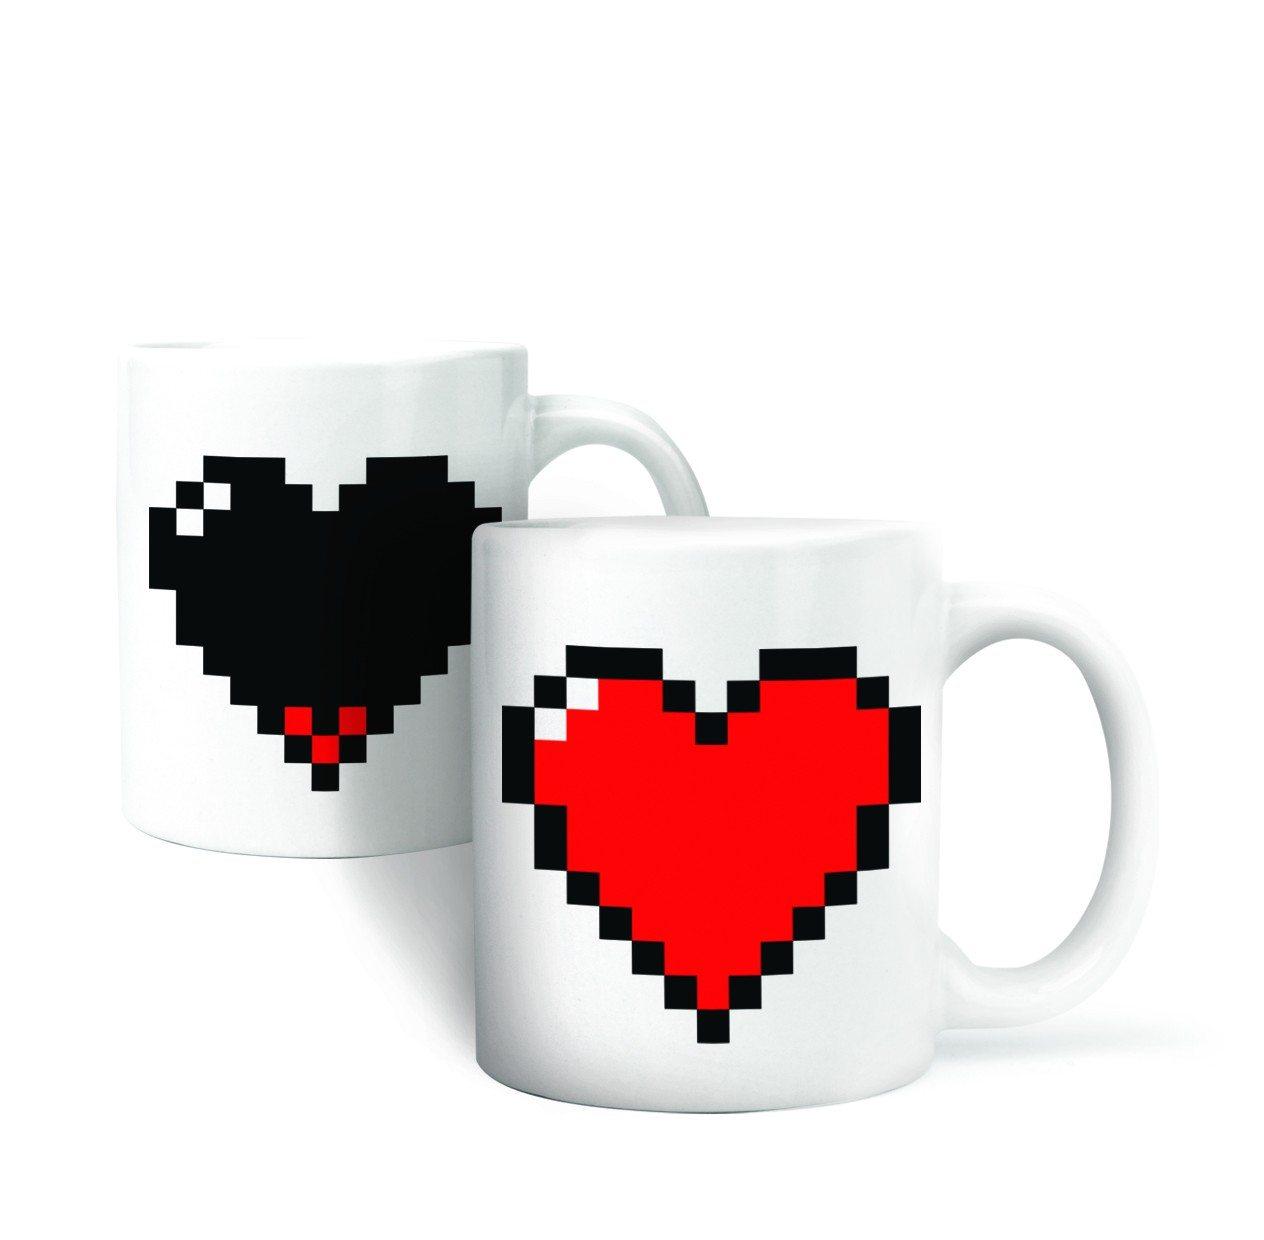 Kop med pixel-hjerte